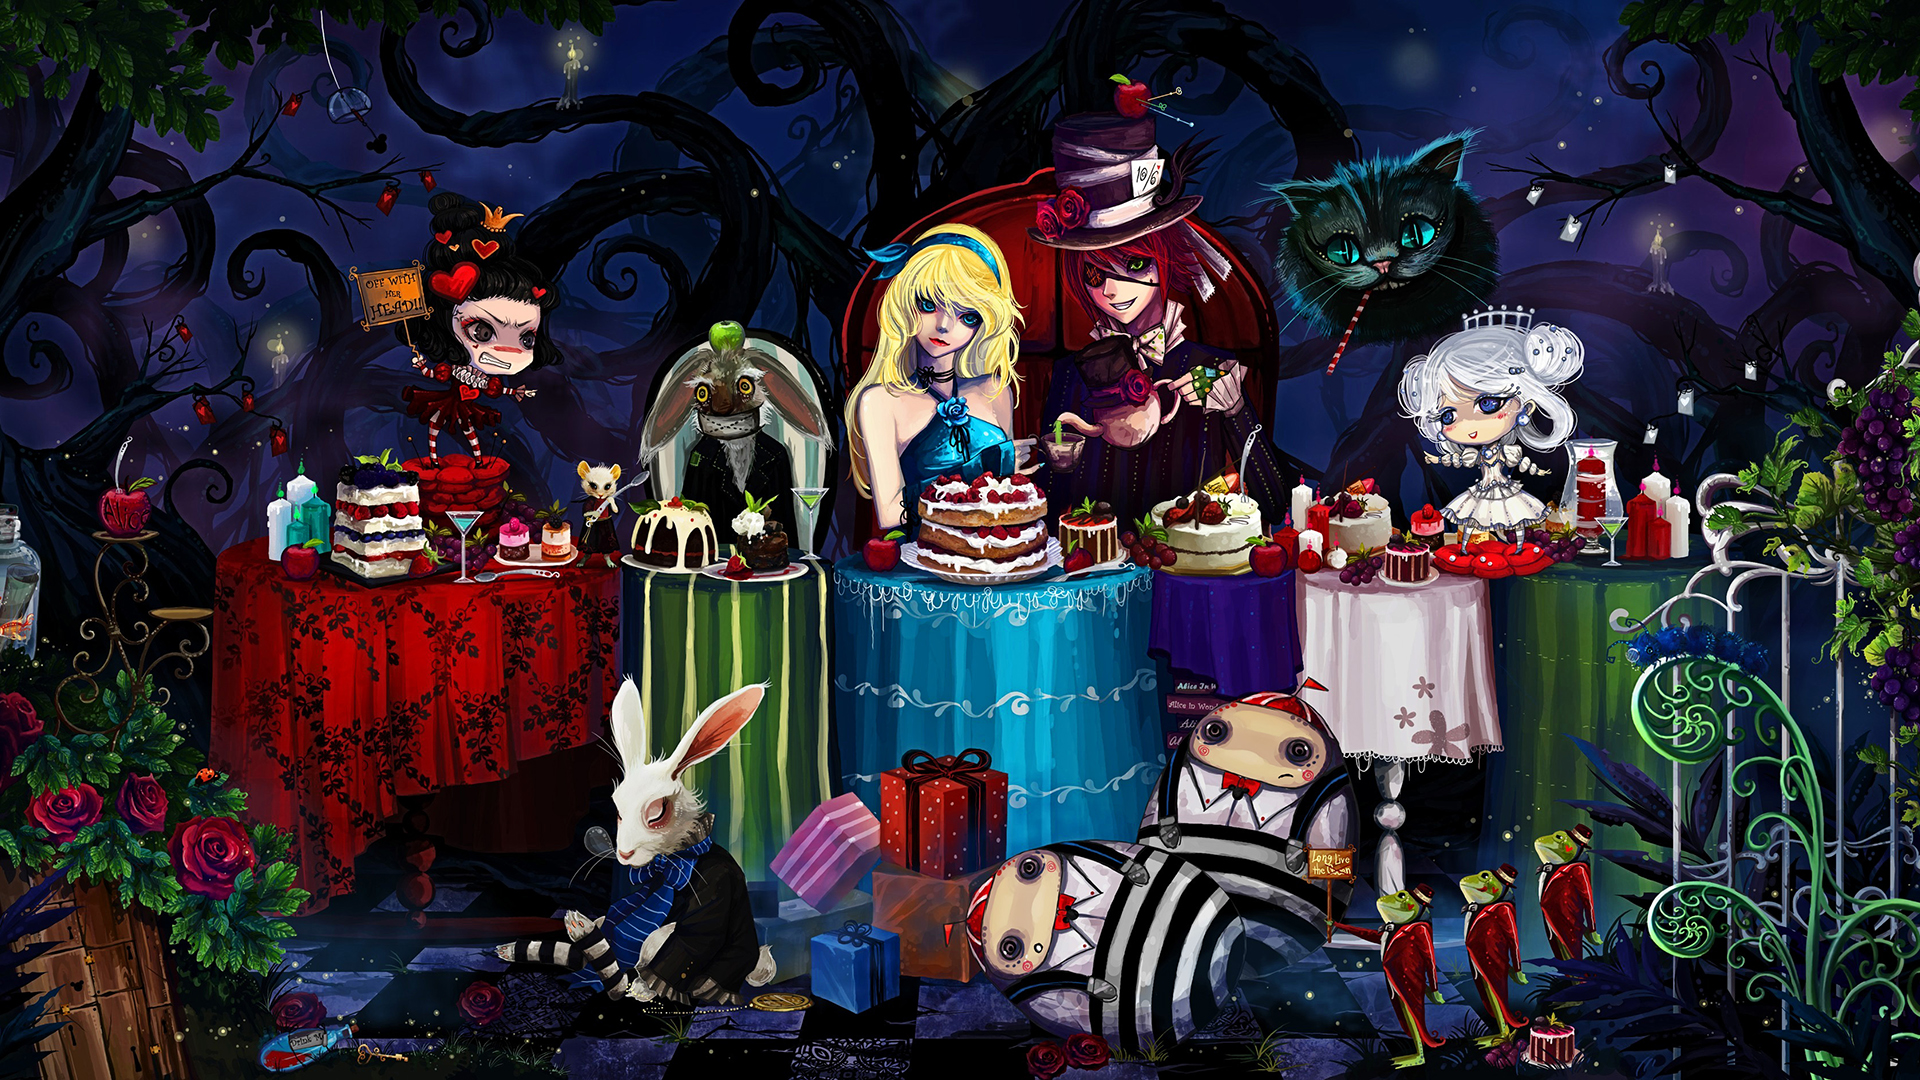 Free Download Hd Alice In Wonderland Wallpaper 1920x1080 For